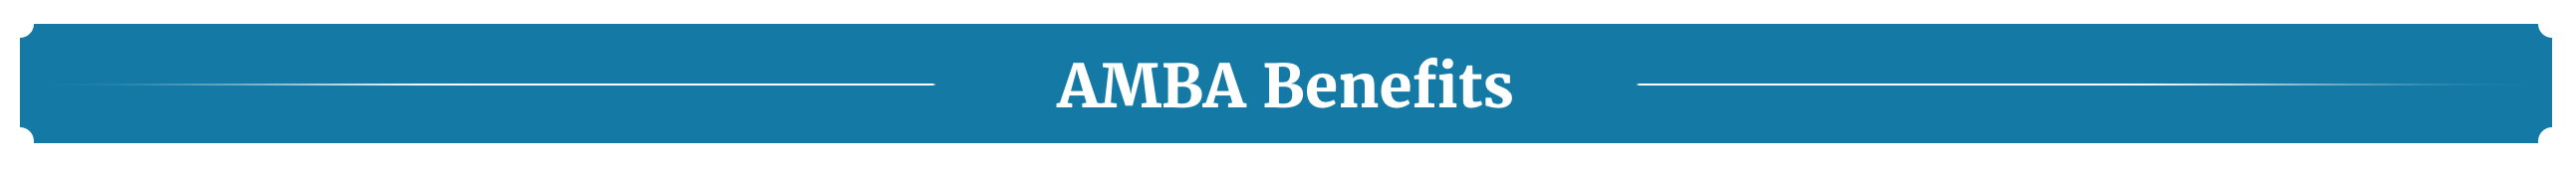 AMBA Benefits Indiana Retired Teachers Association